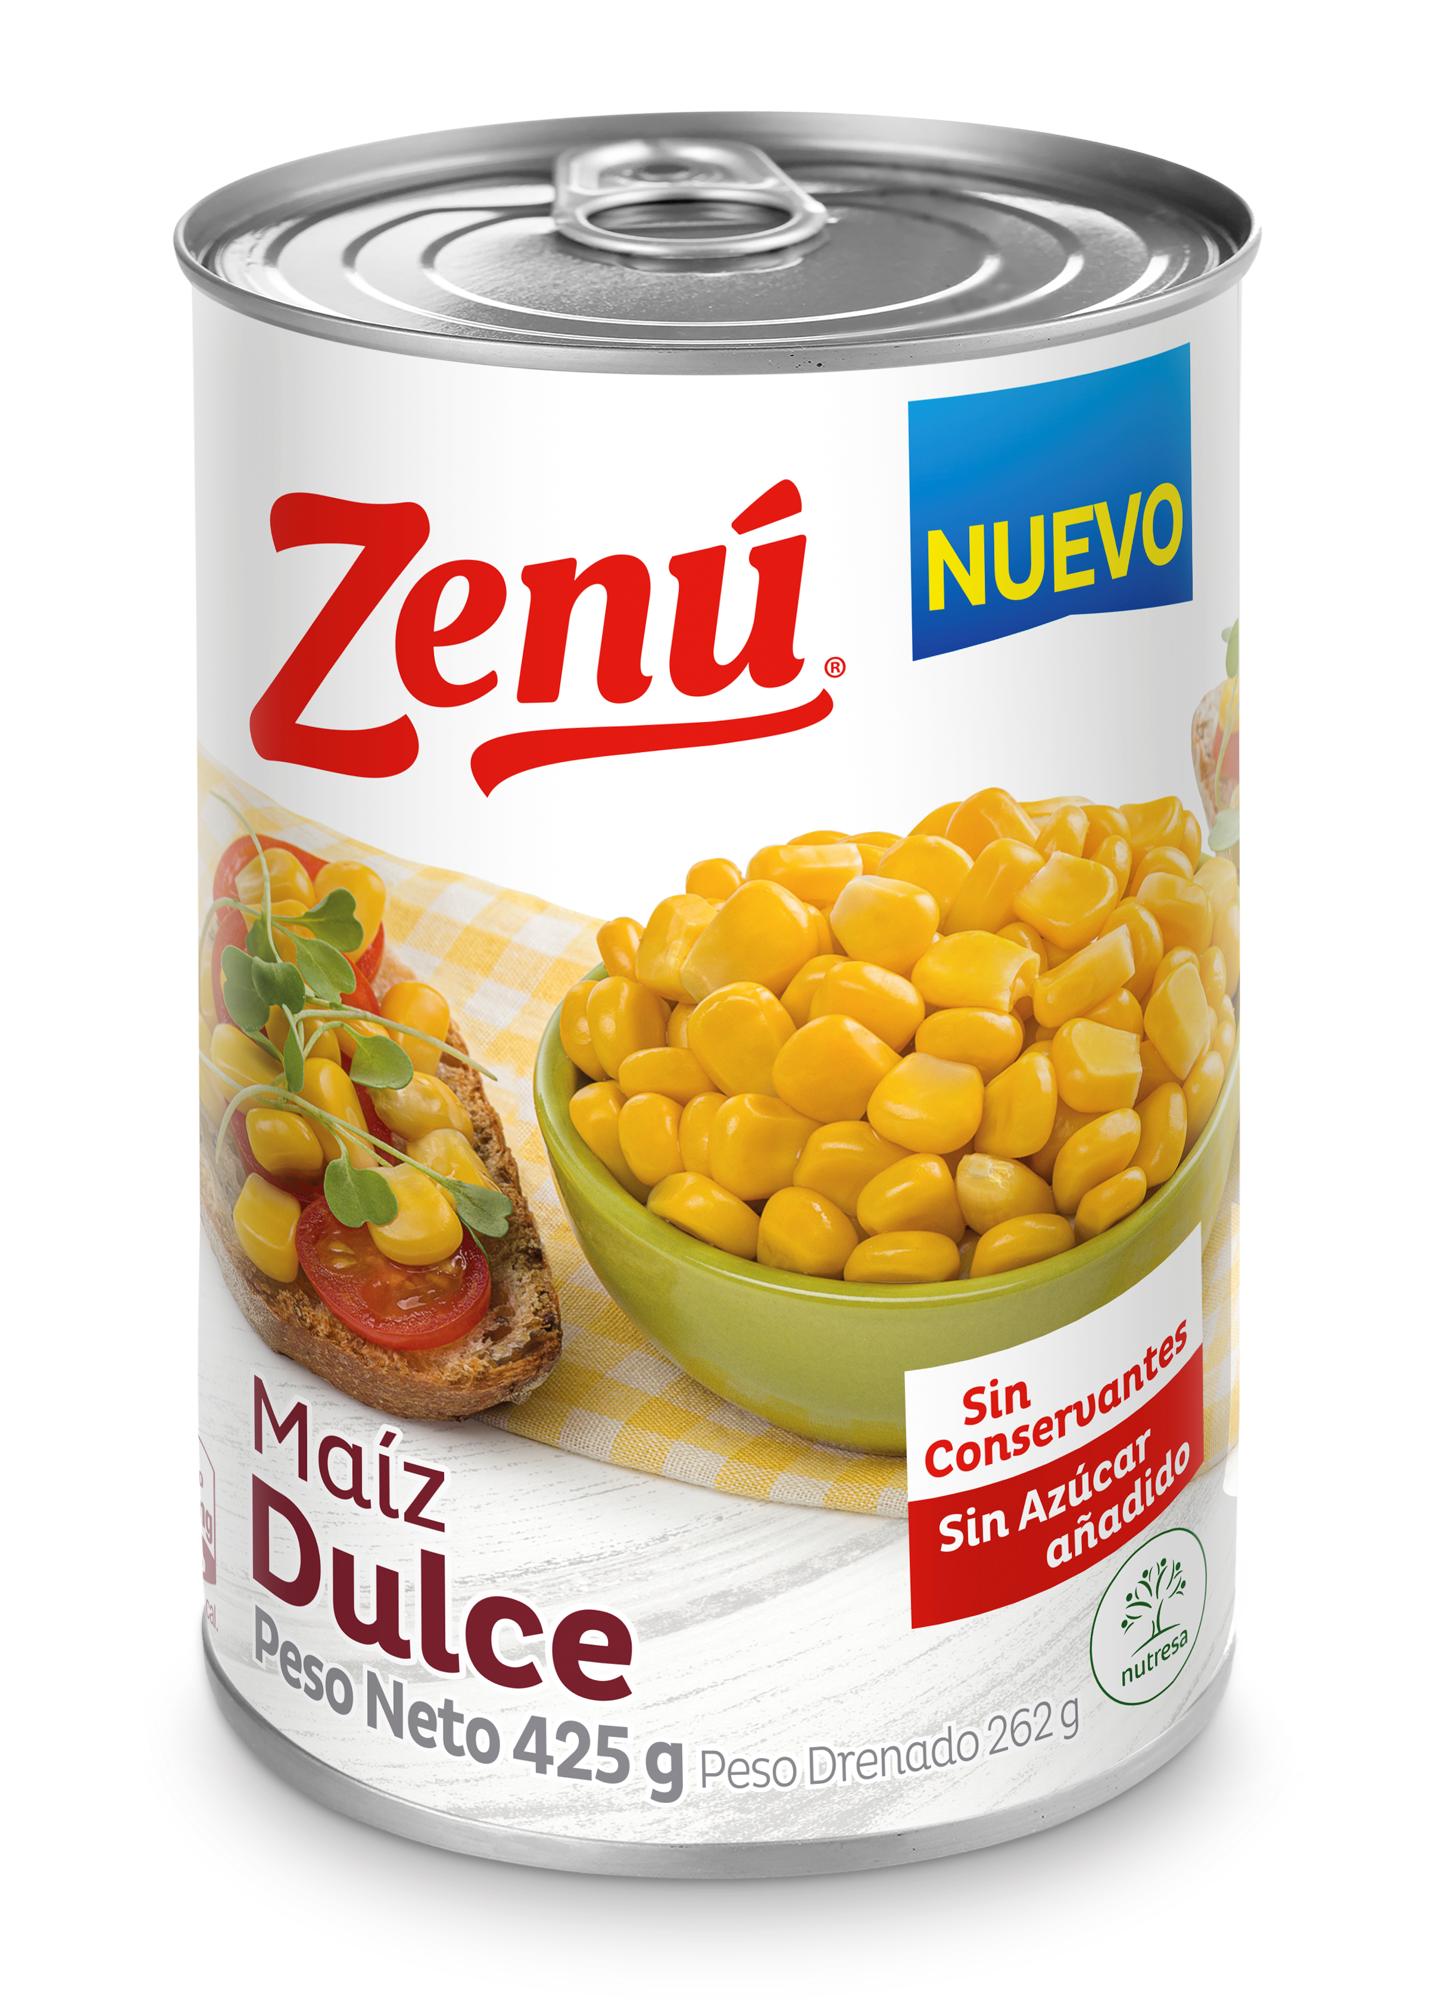 Maiz Dulce Zenu 425g